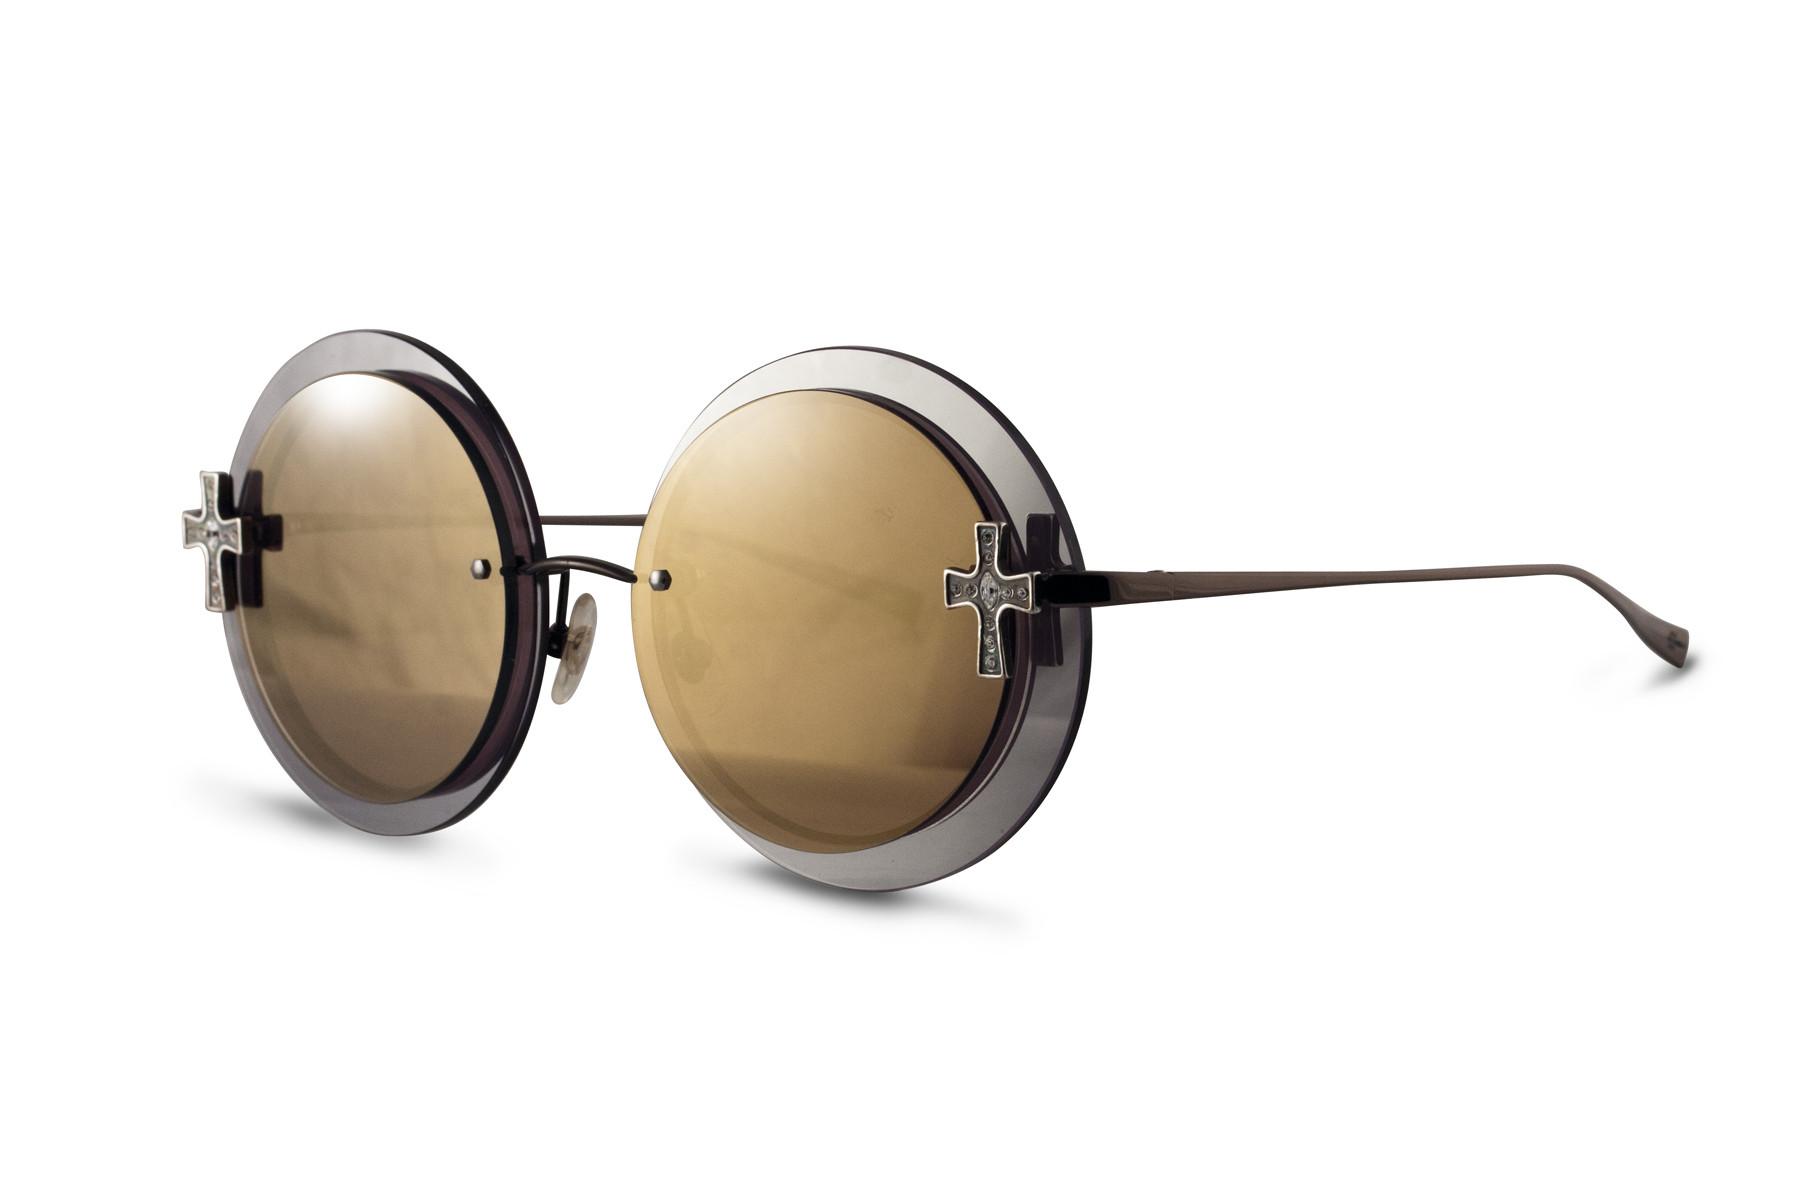 Loree rodkin scarlet sunglasses for Decor my eyes